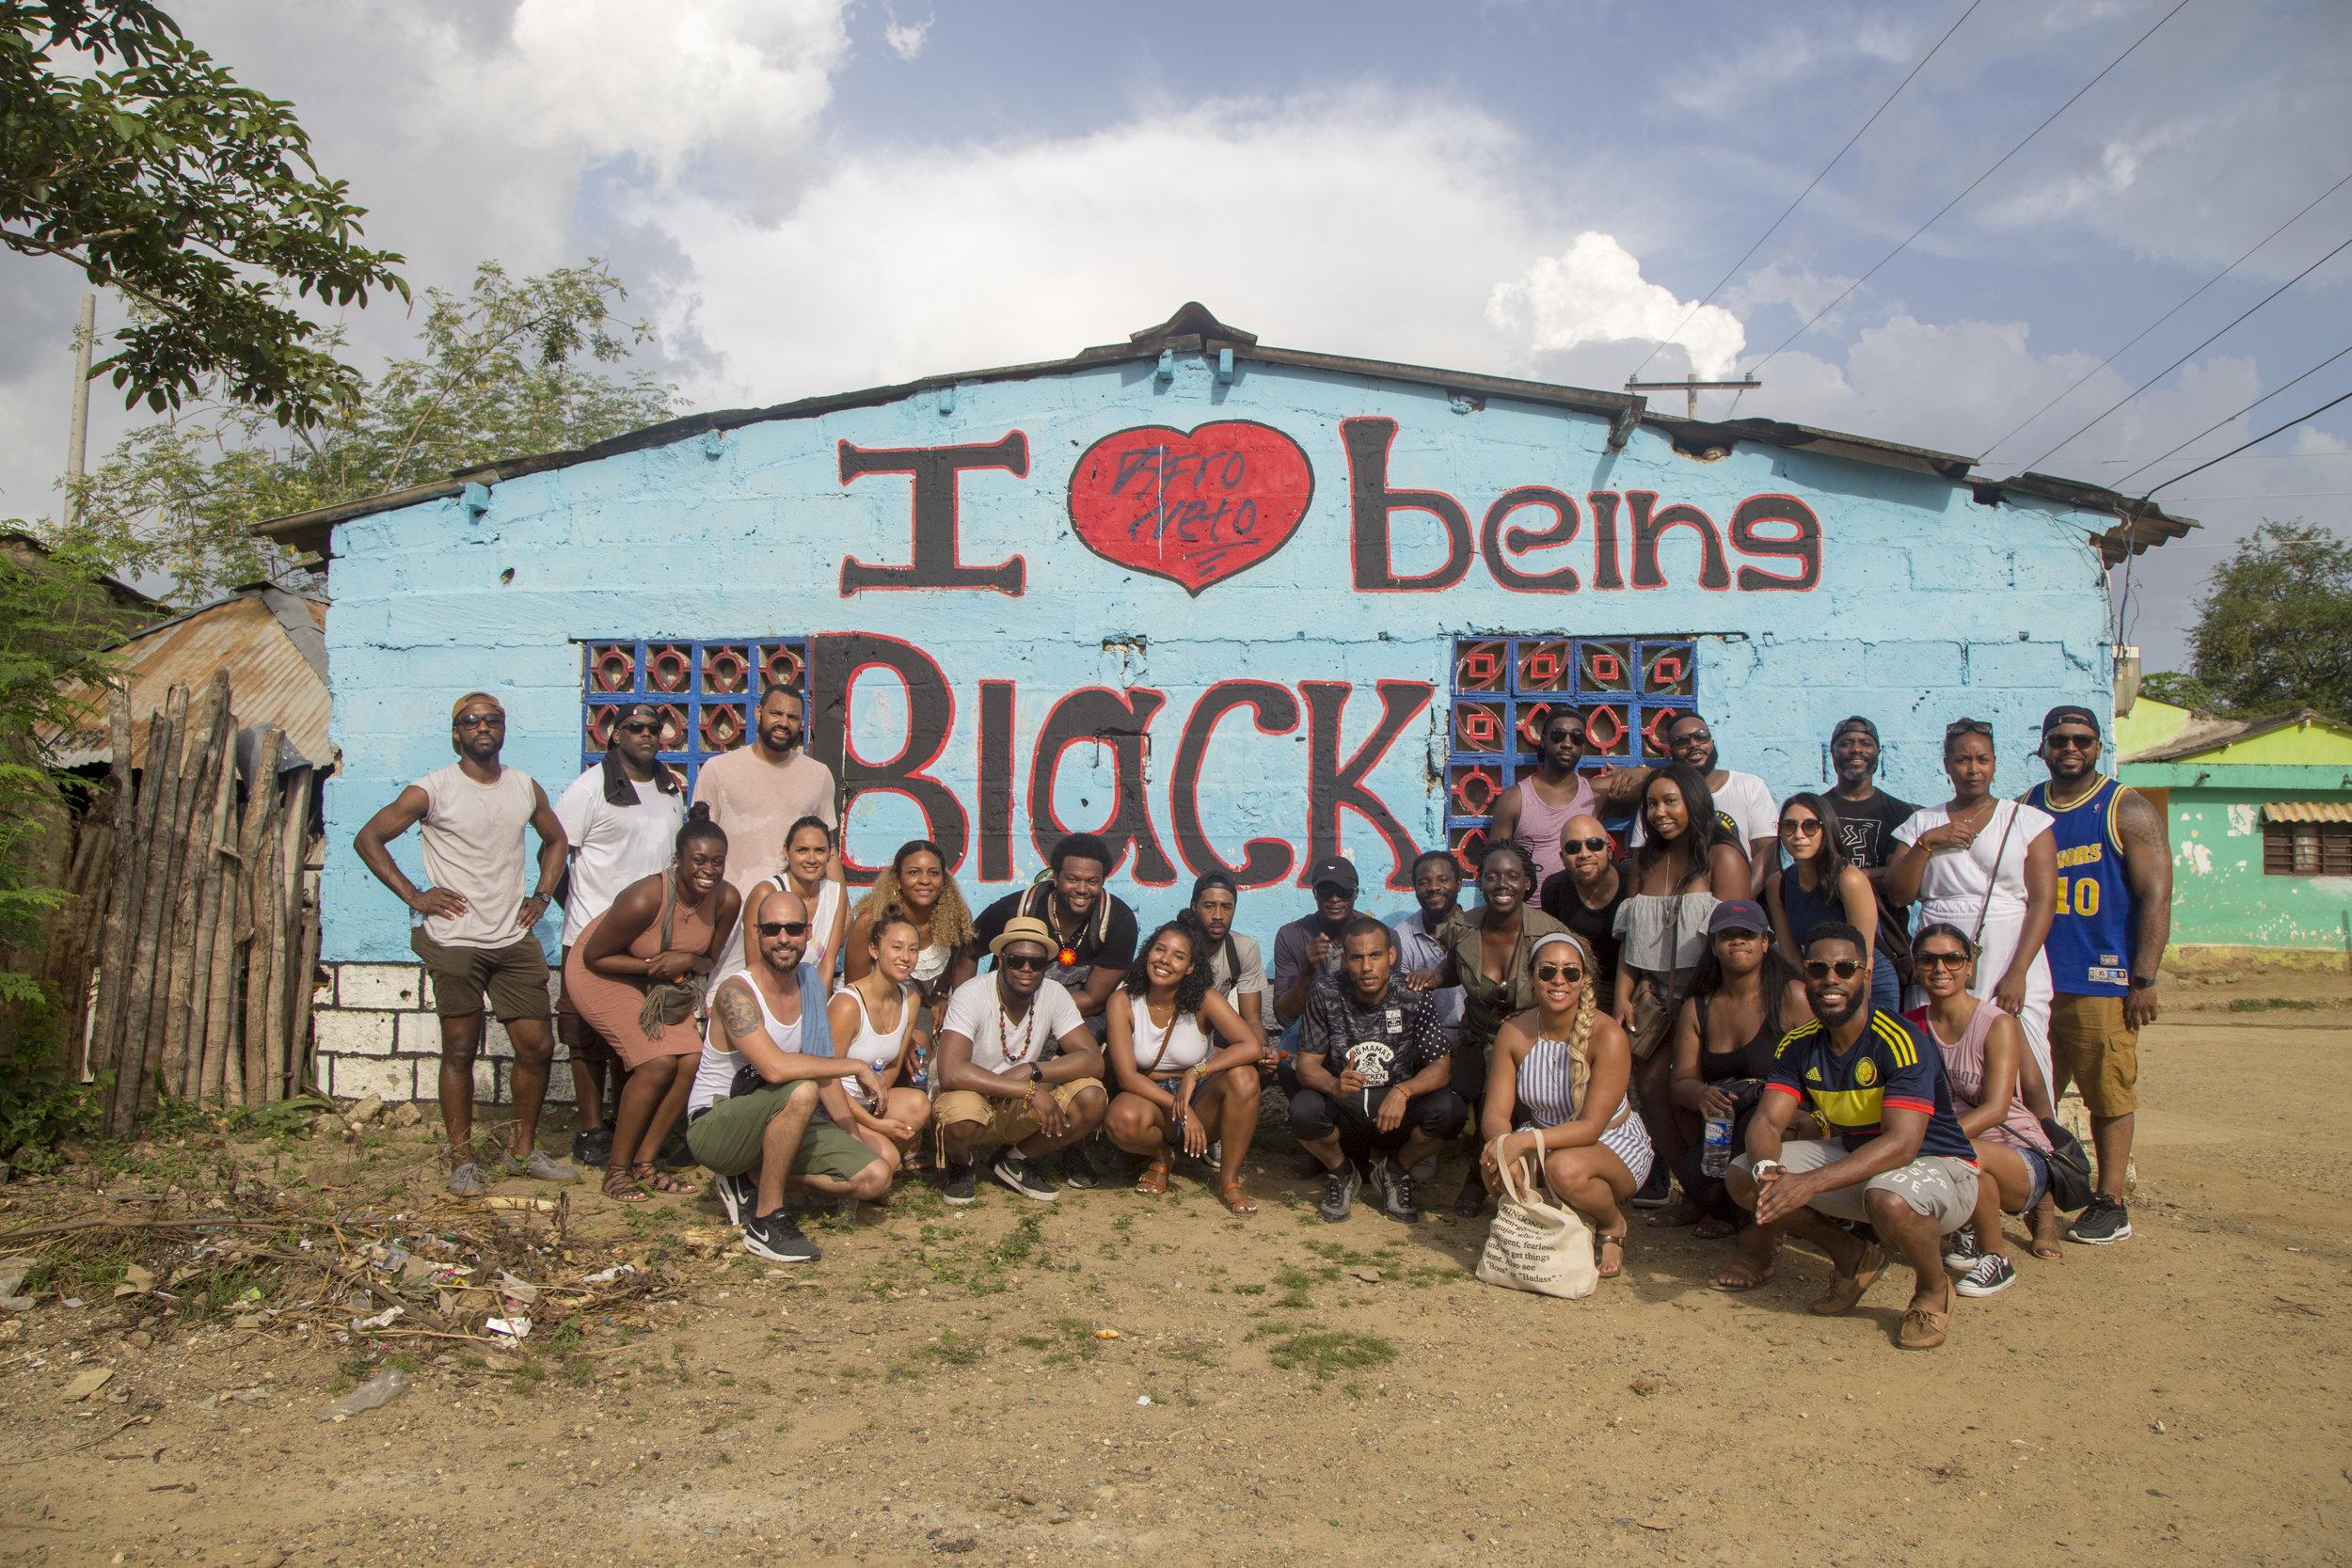 The Black Arrow group as we visited San Basilio de Palenque, Colombia.